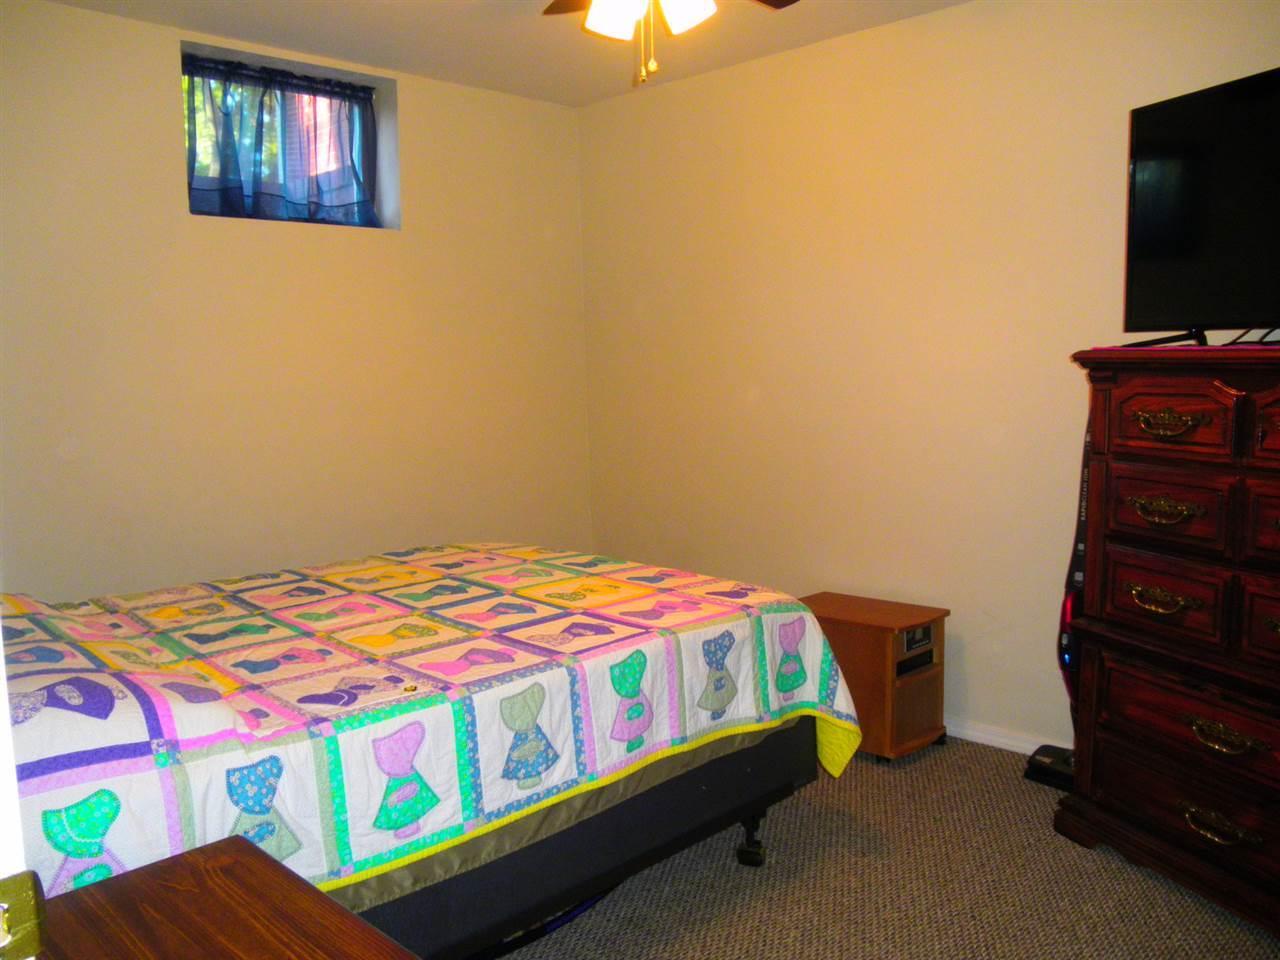 Sold Cross Sale W/ MLS | 32 Raintree Ponca City, OK 74604 22